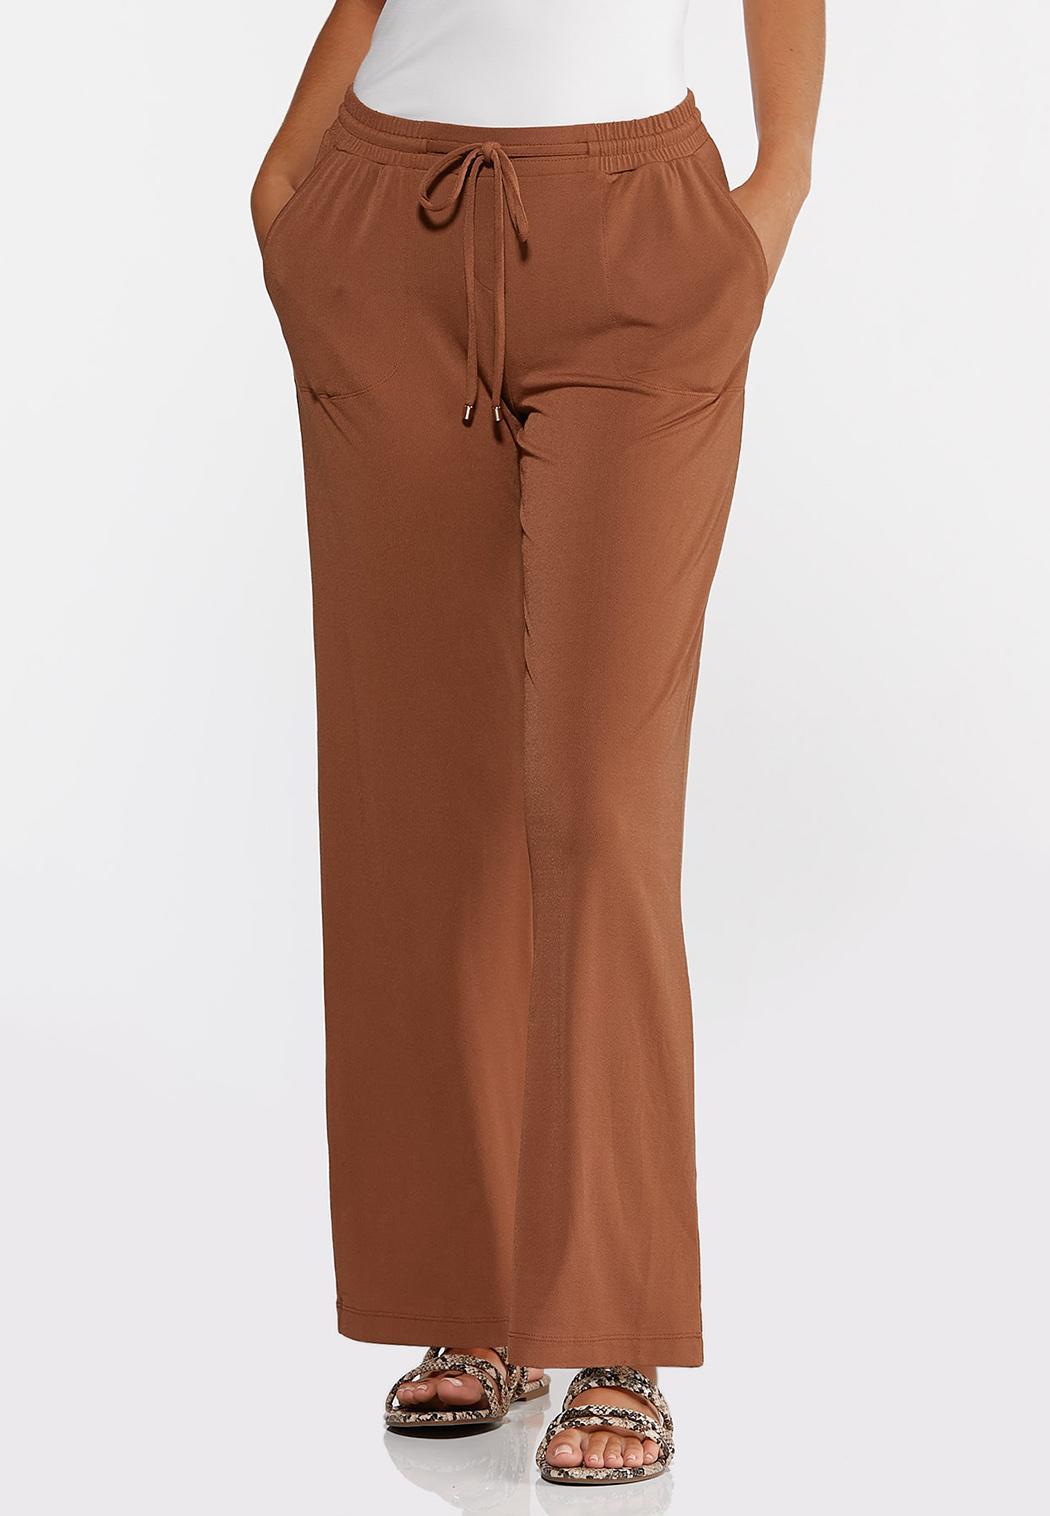 Petite Solid Wide Leg Pants